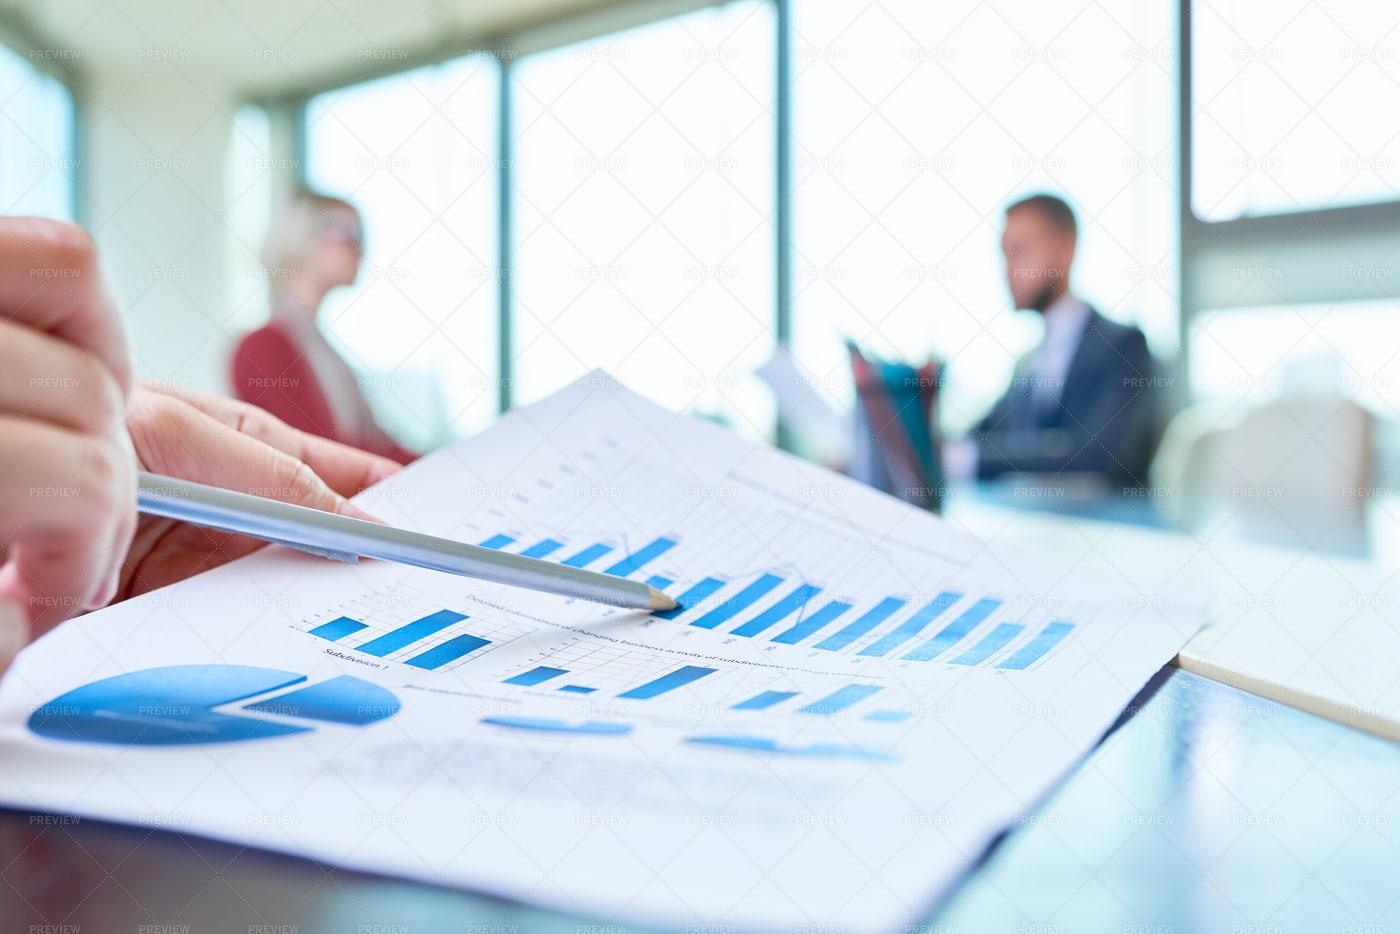 Hand Pointing At Statistics Graph: Stock Photos